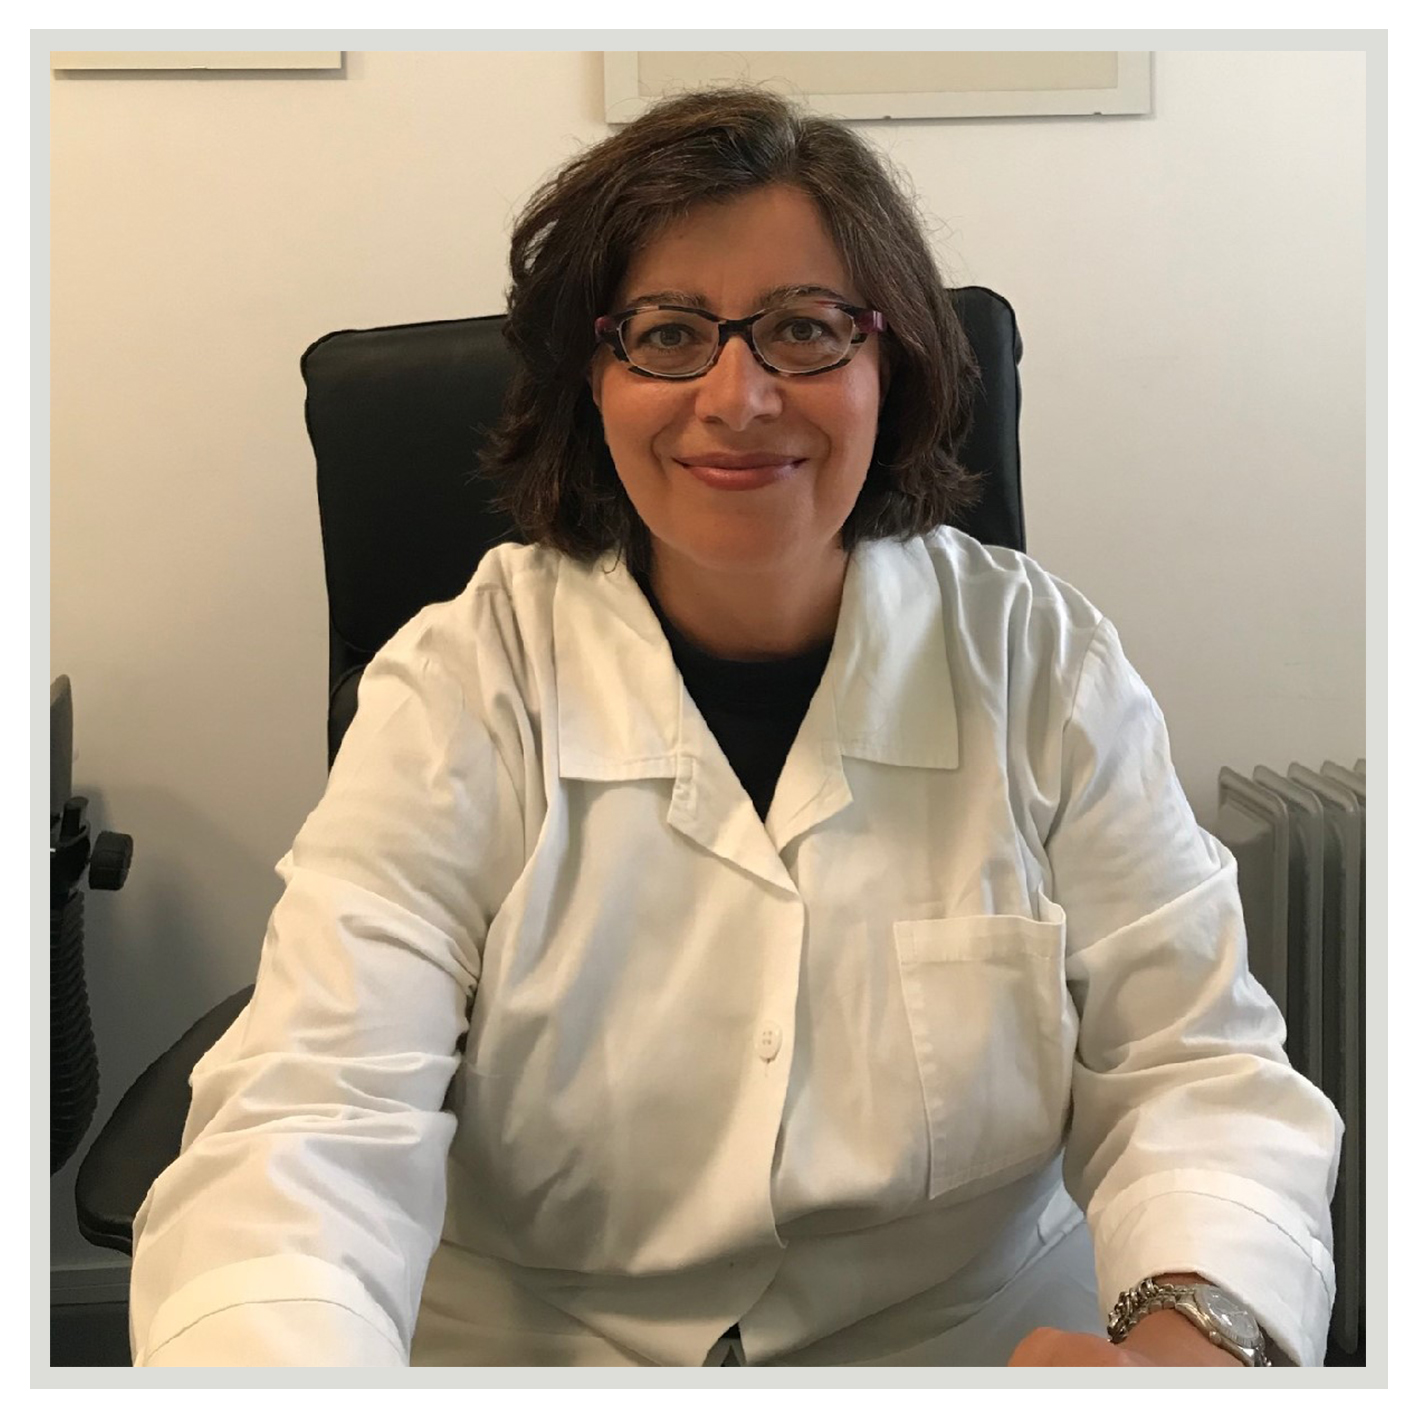 Dott.ssa Antonia Napoli